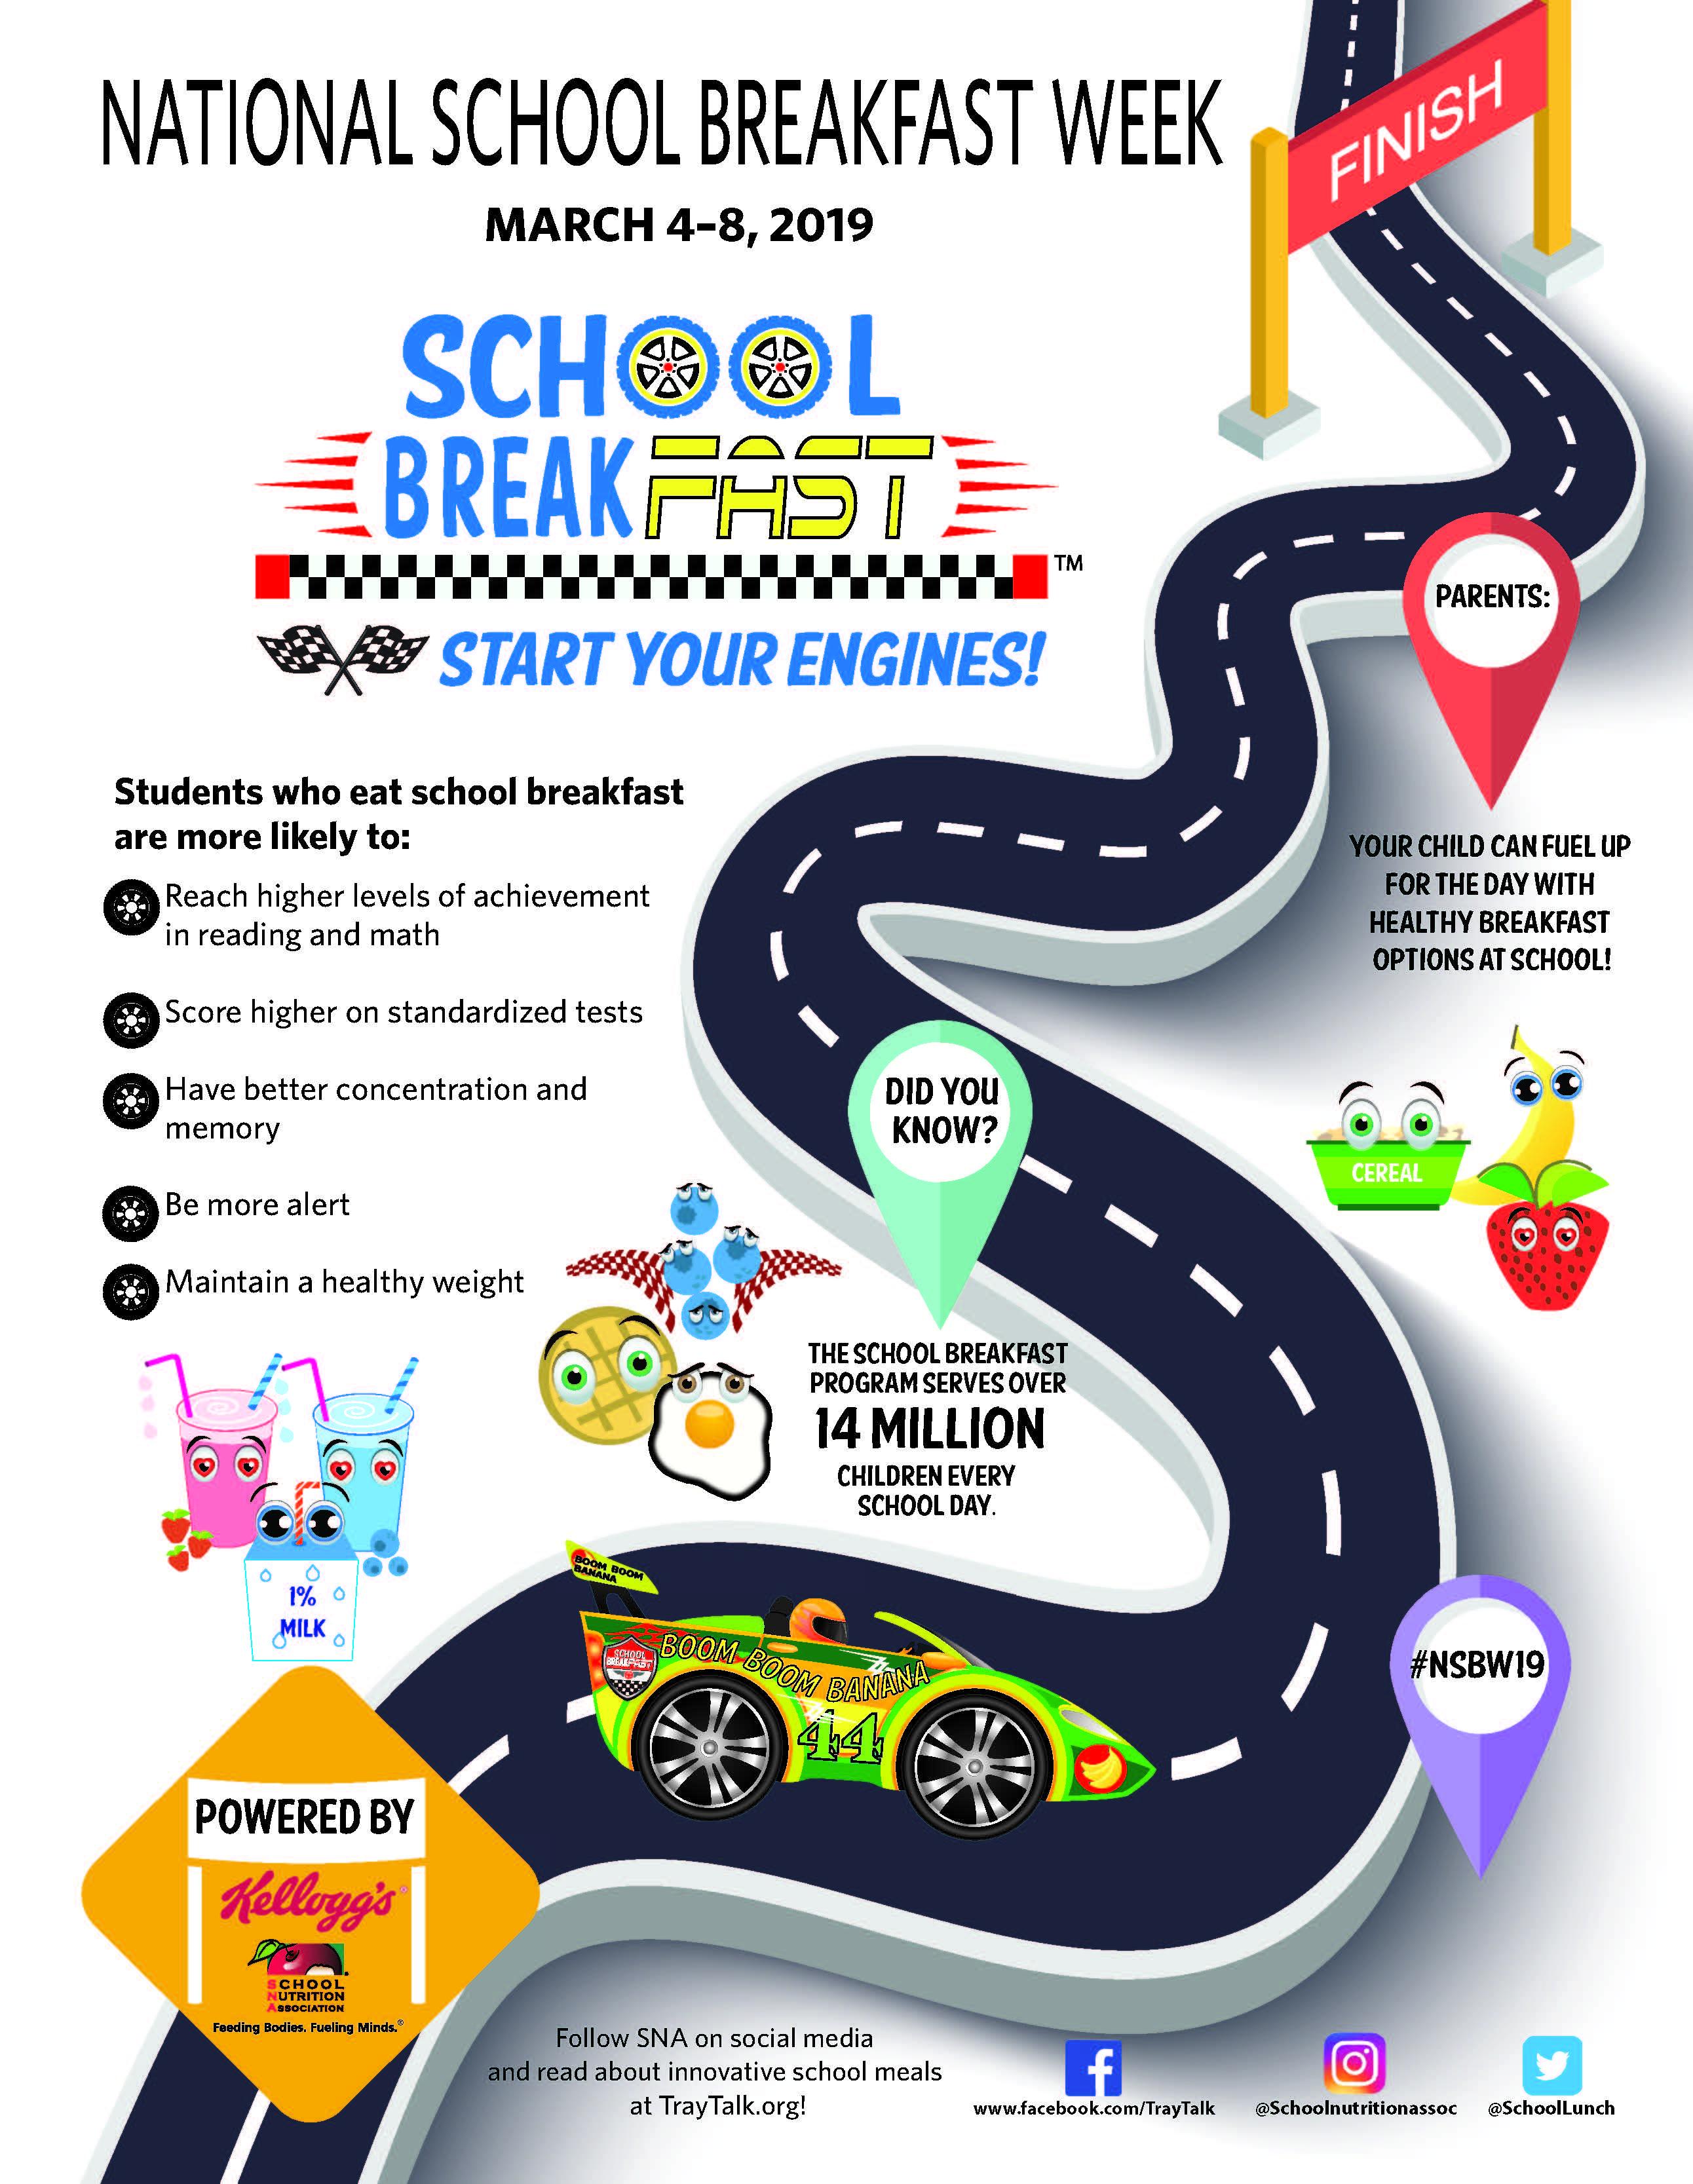 NSBW19-infographic.jpg